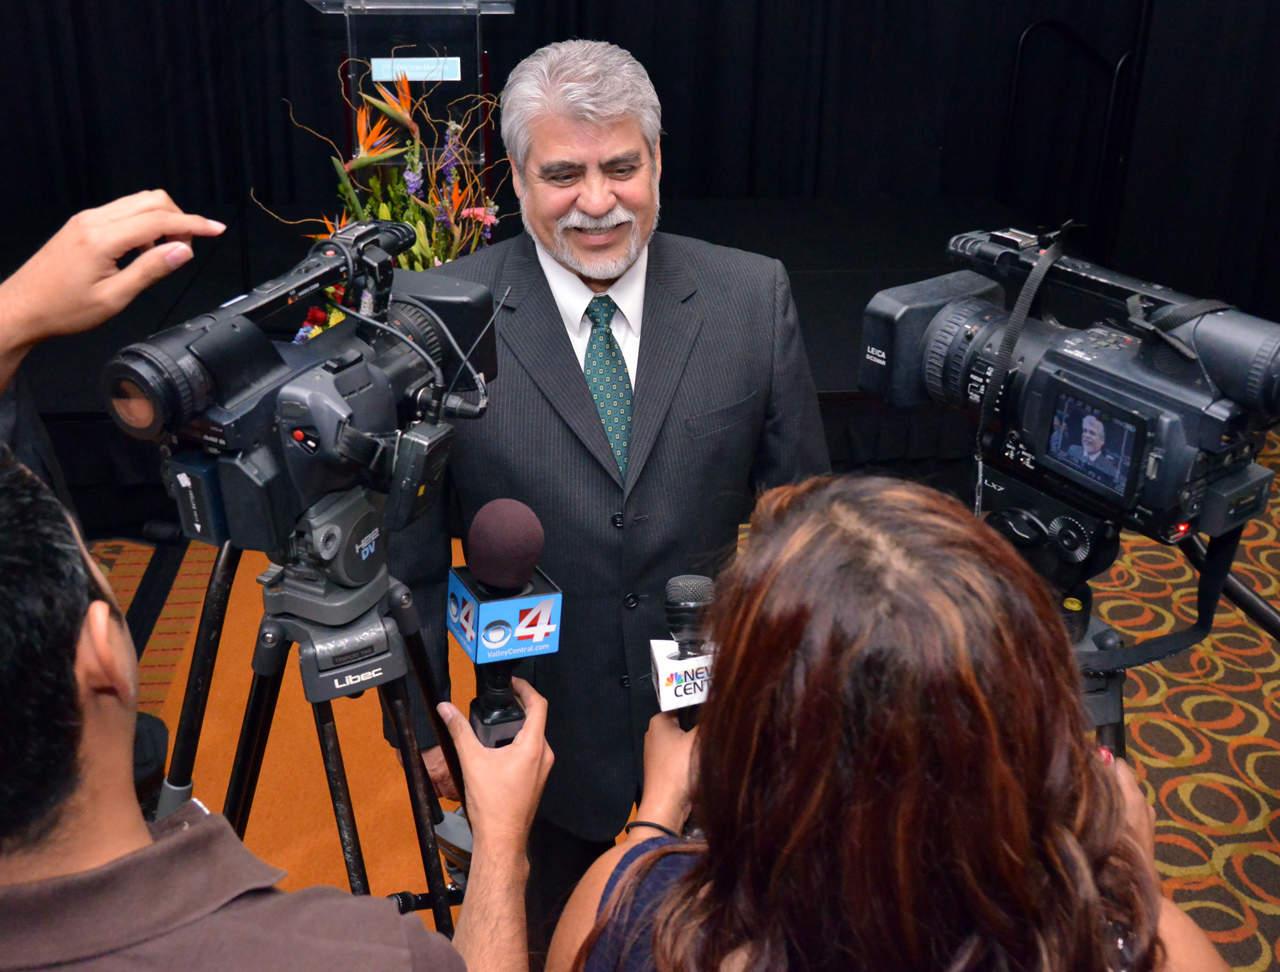 Photograph By ROBERTO GONZÁLEZ/Texas Border Business/Mega Doctor News